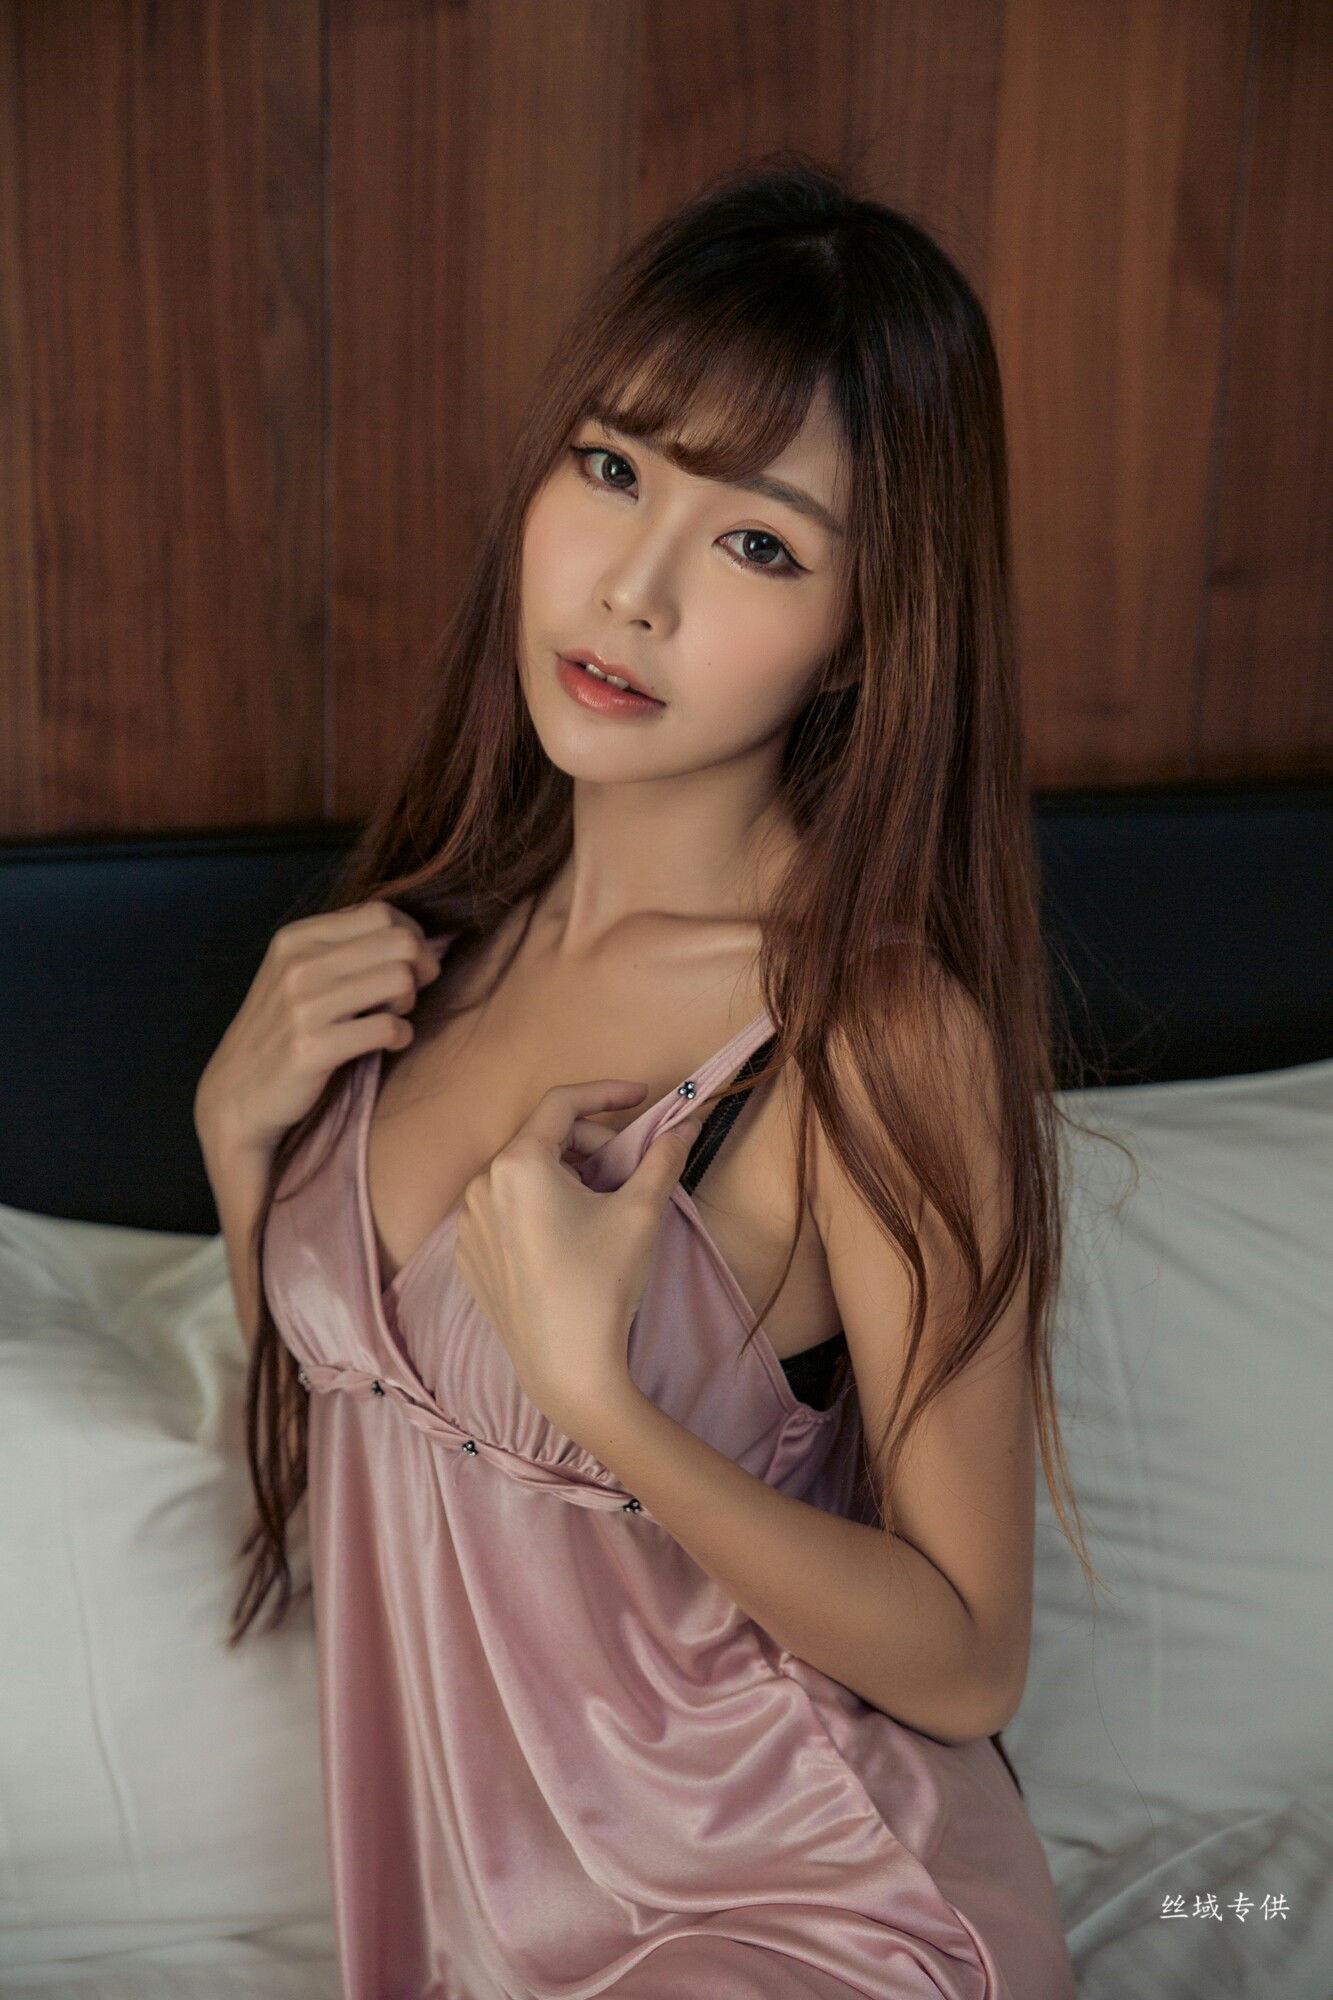 VOL.1074 [台湾正妹]睡衣妹子少妇:黄上晏(黄上晏Rubis)超高清个人性感漂亮大图(32P)